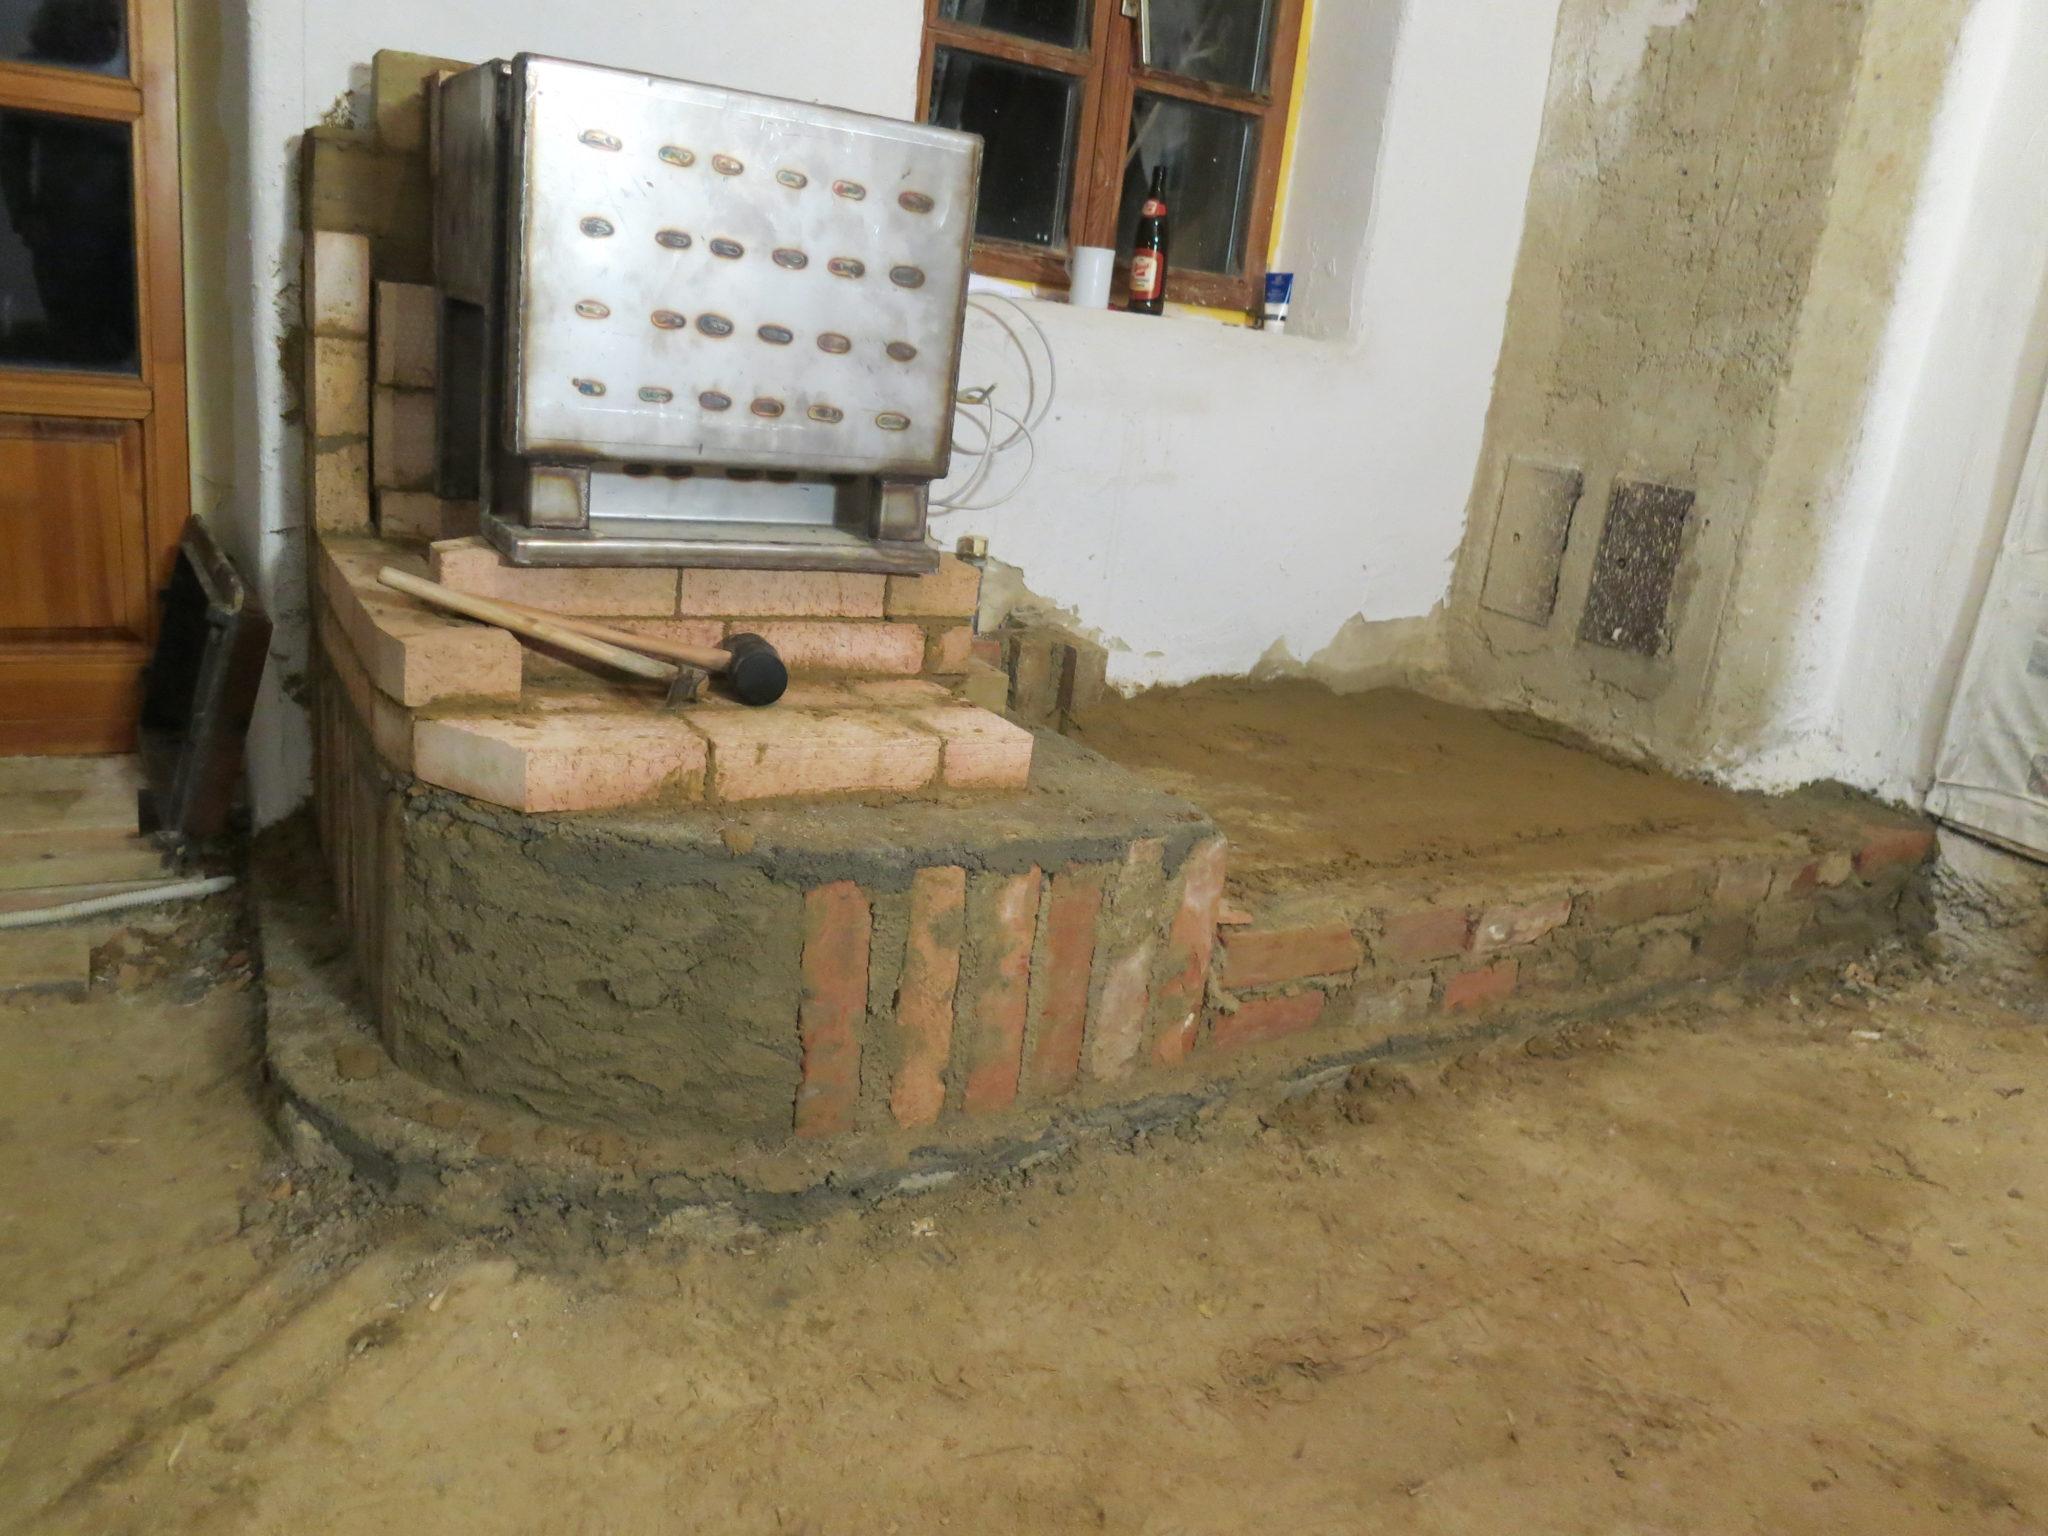 Lehm Heizofen Niedersulz im Bau